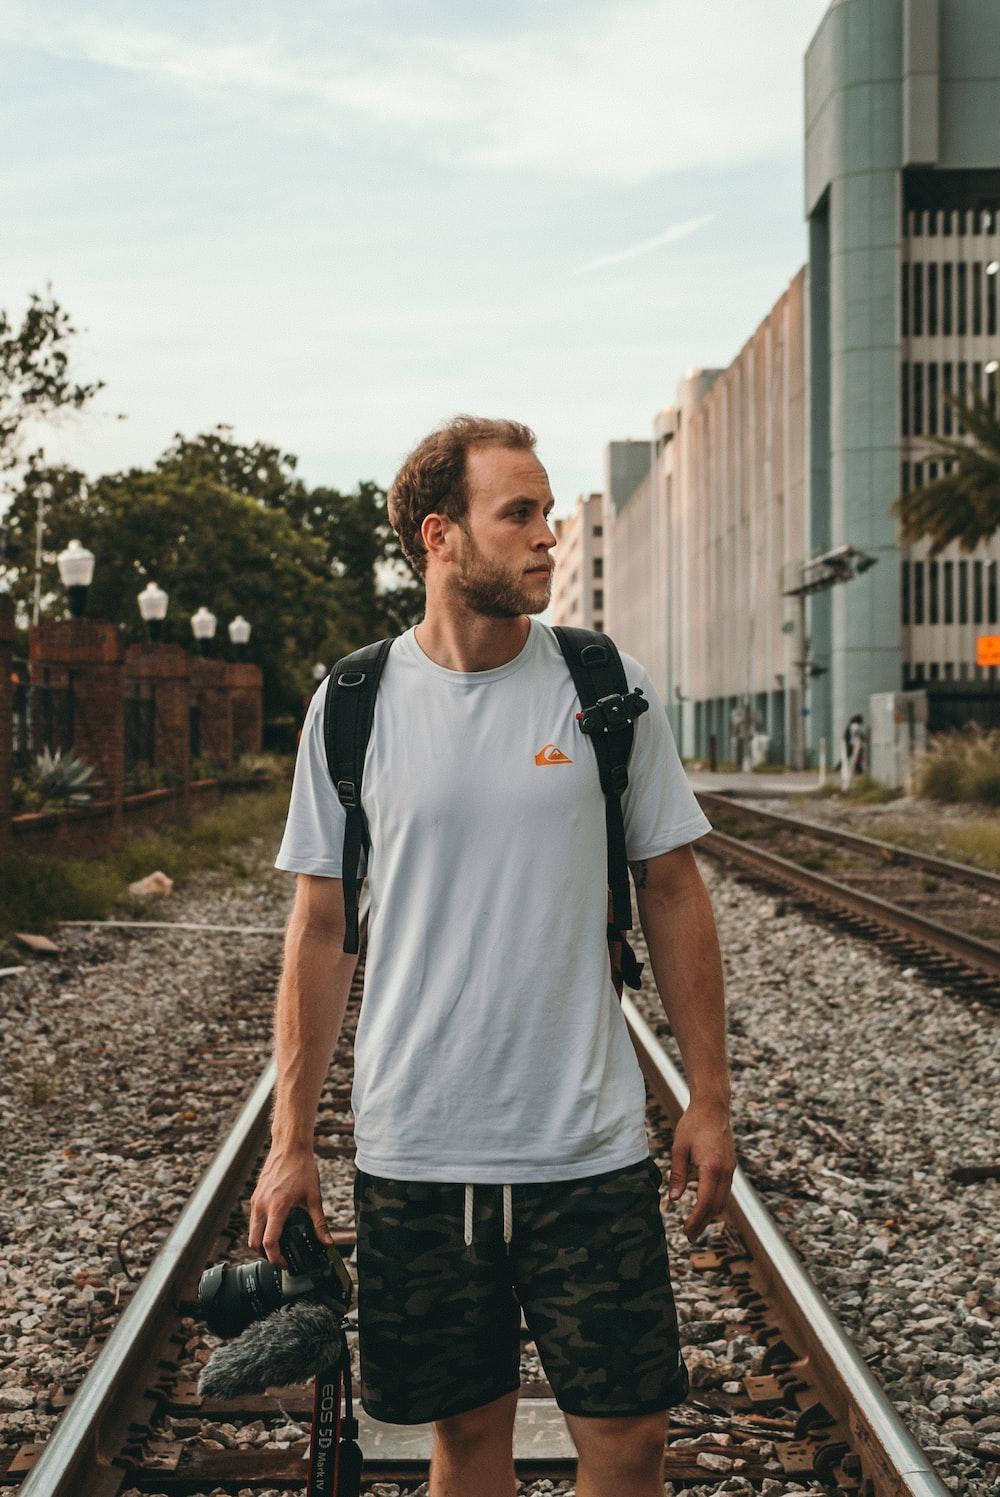 man standing on train rail at daytime